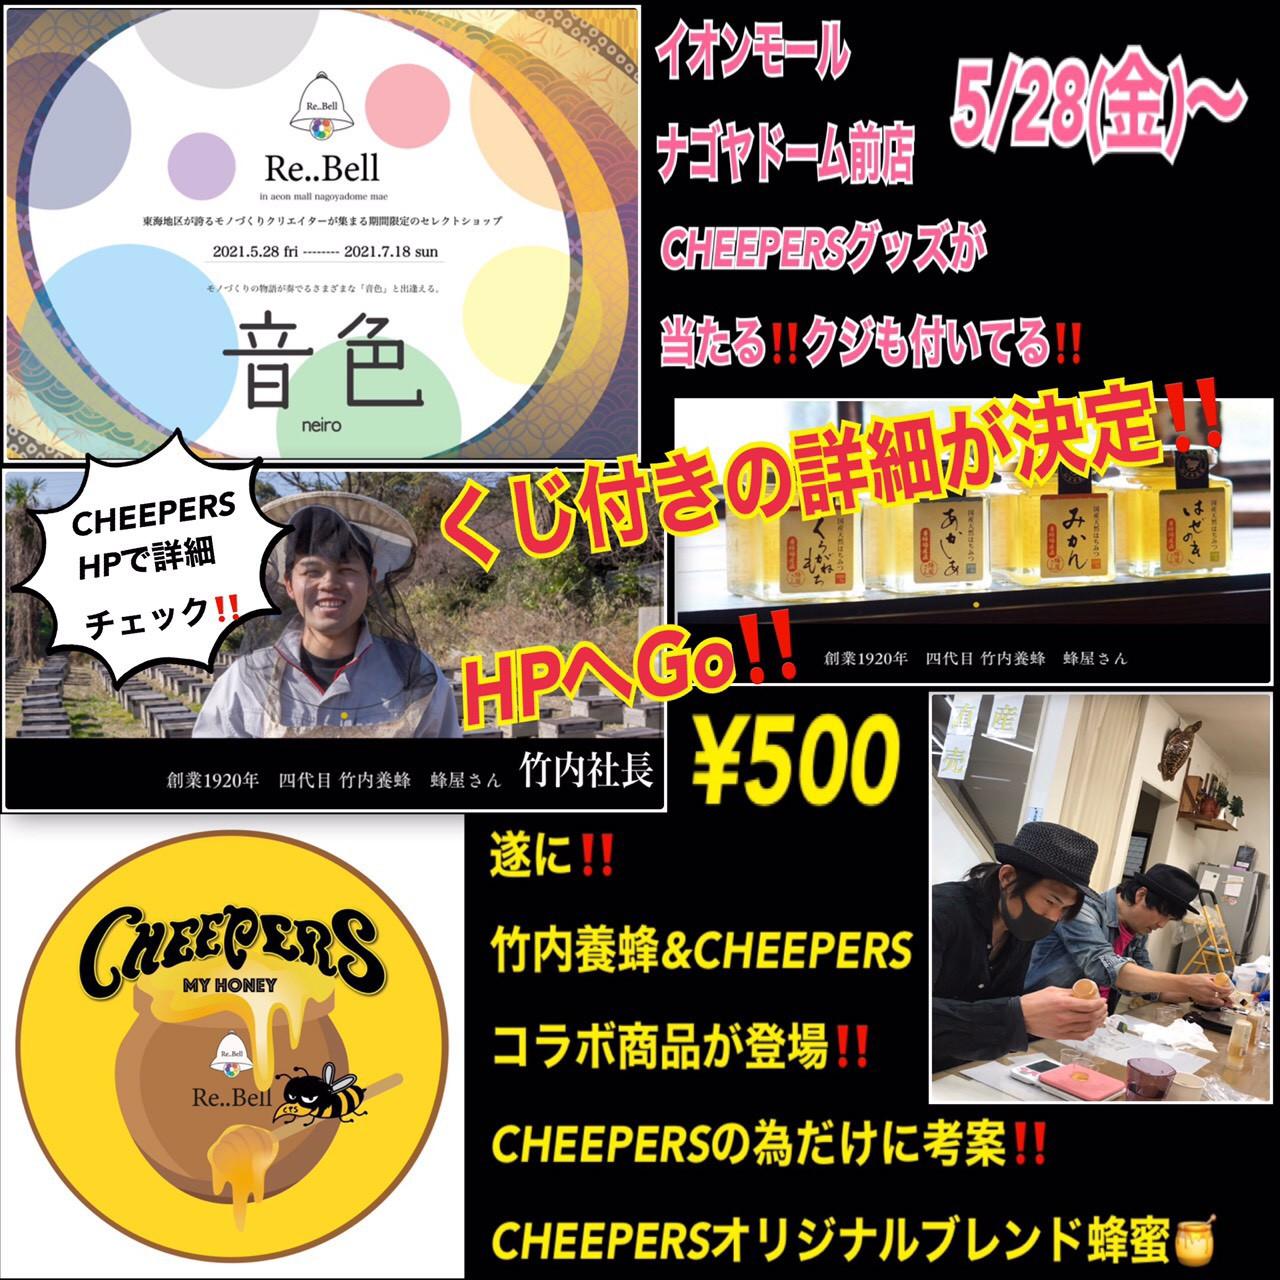 S__99090444.jpg